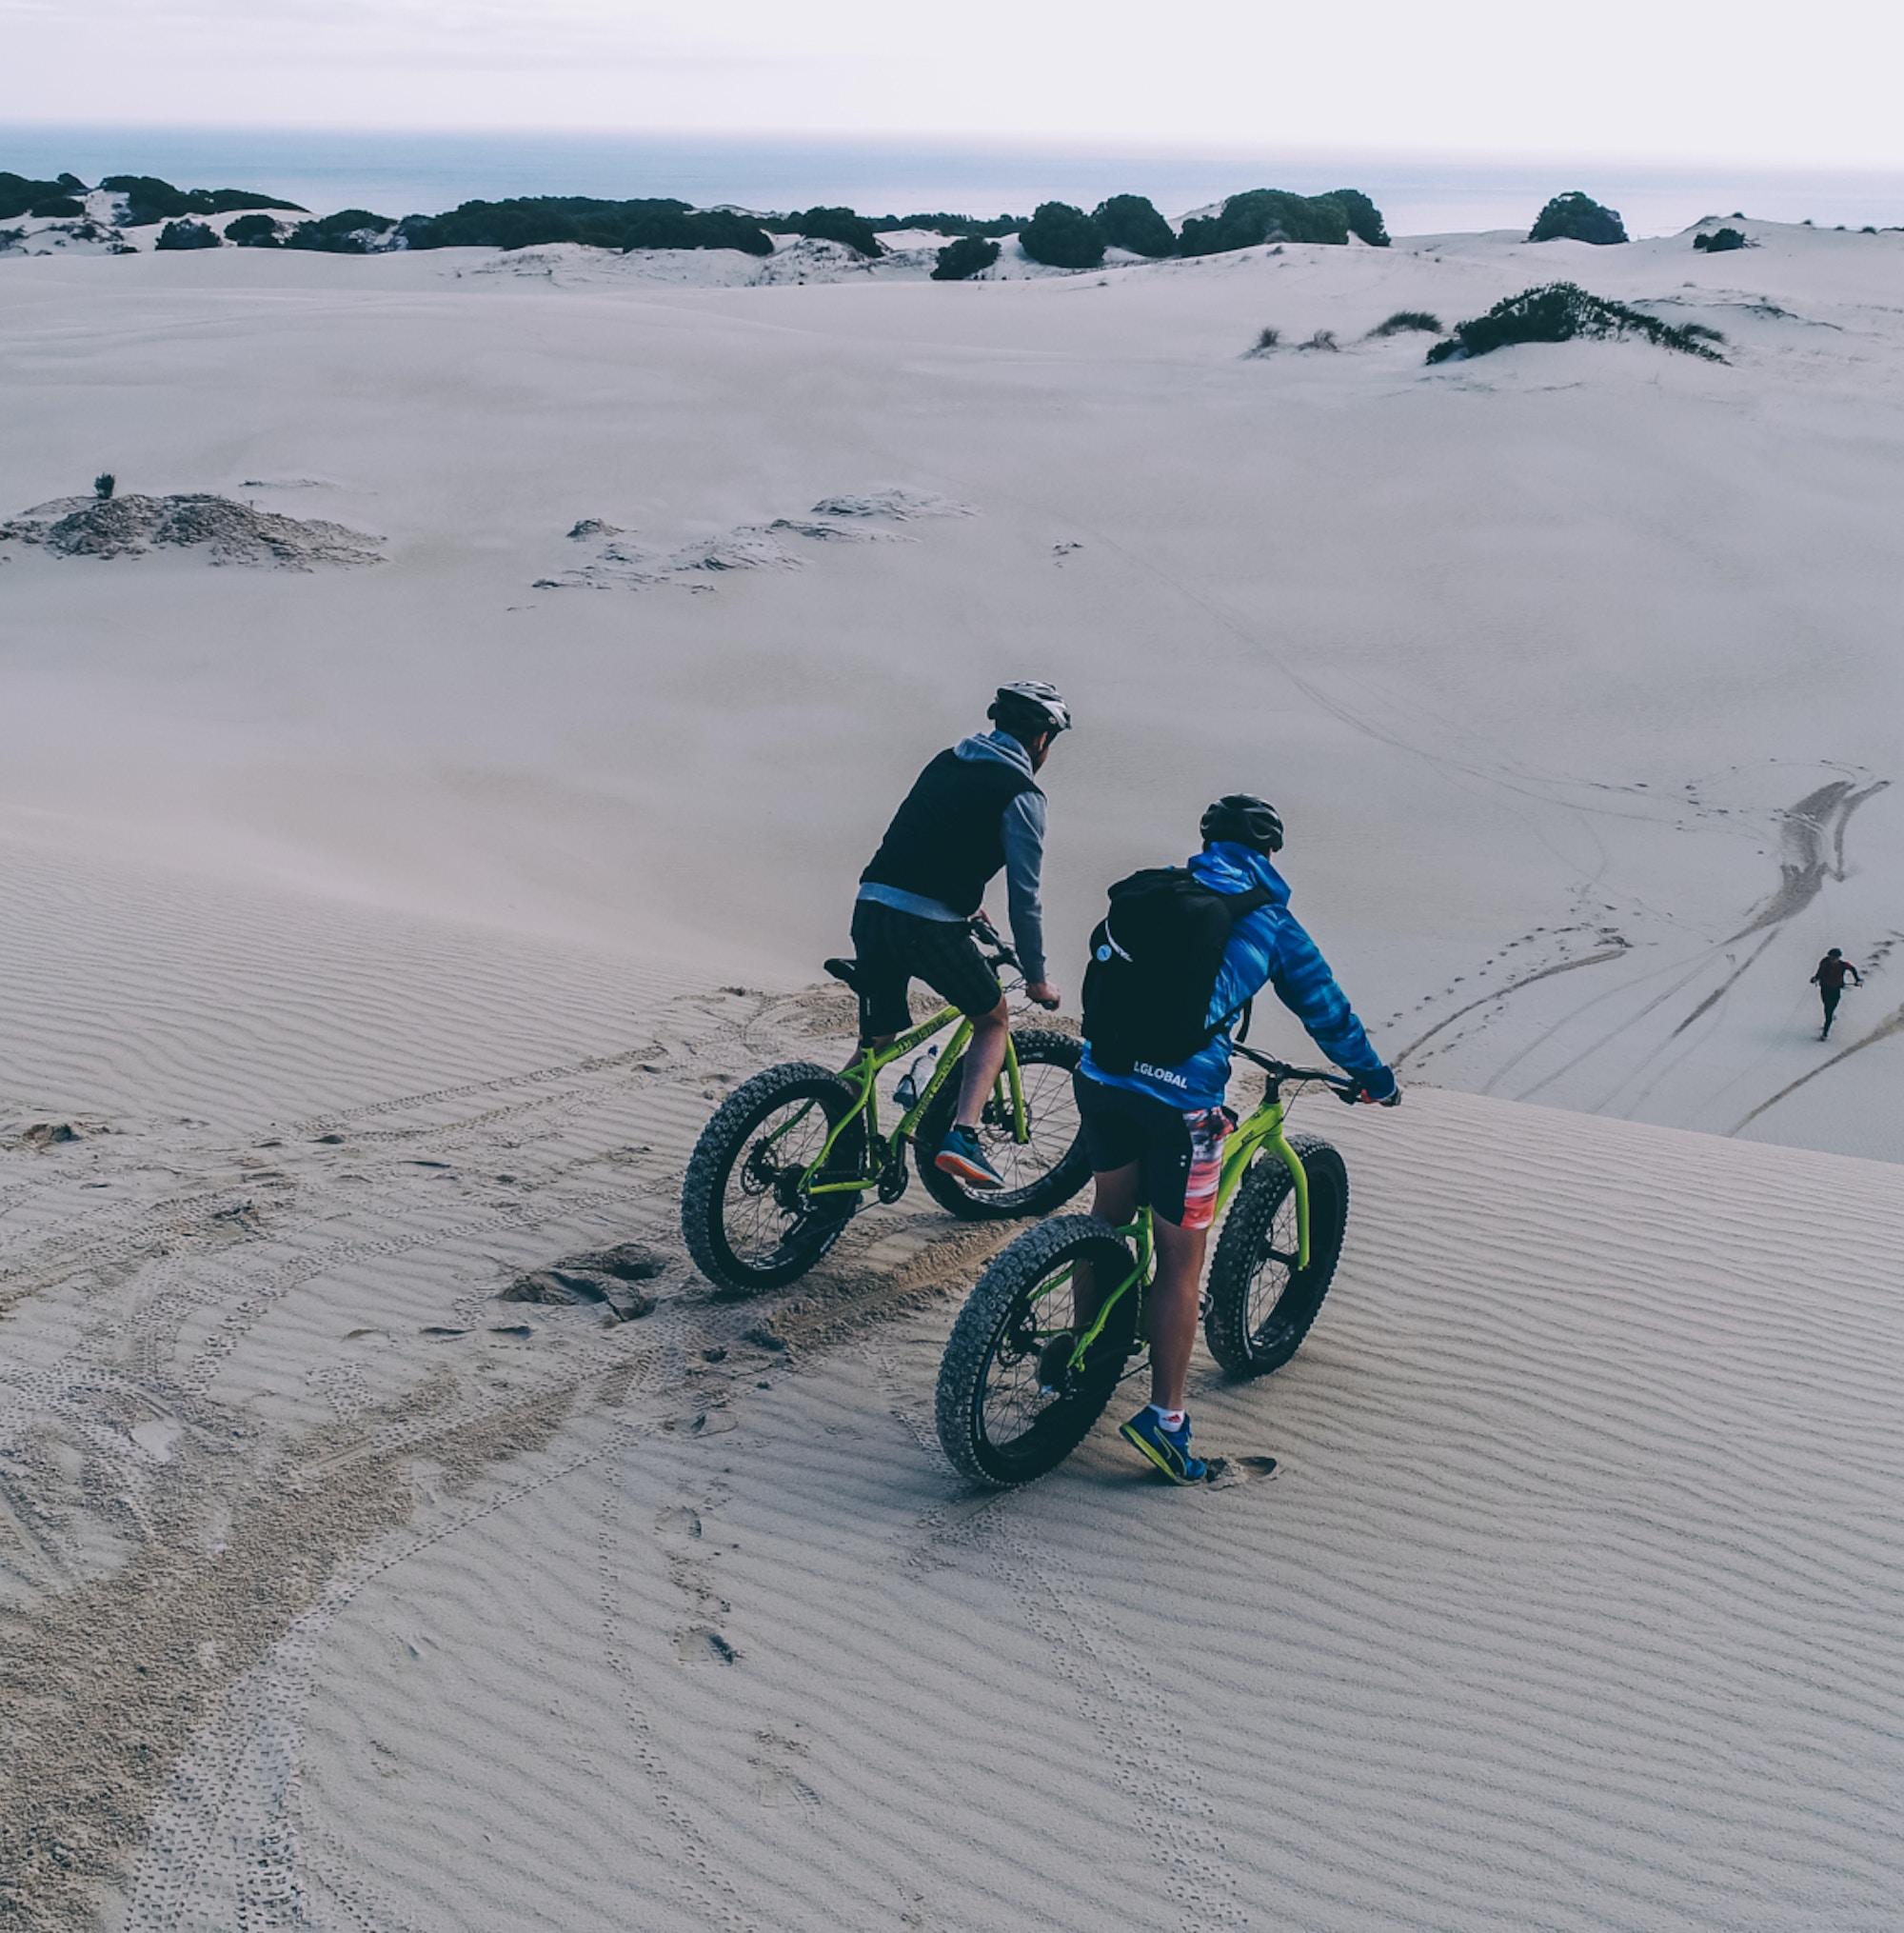 Fat Biking in the dunes of Gansbaai jpg discoverctwc